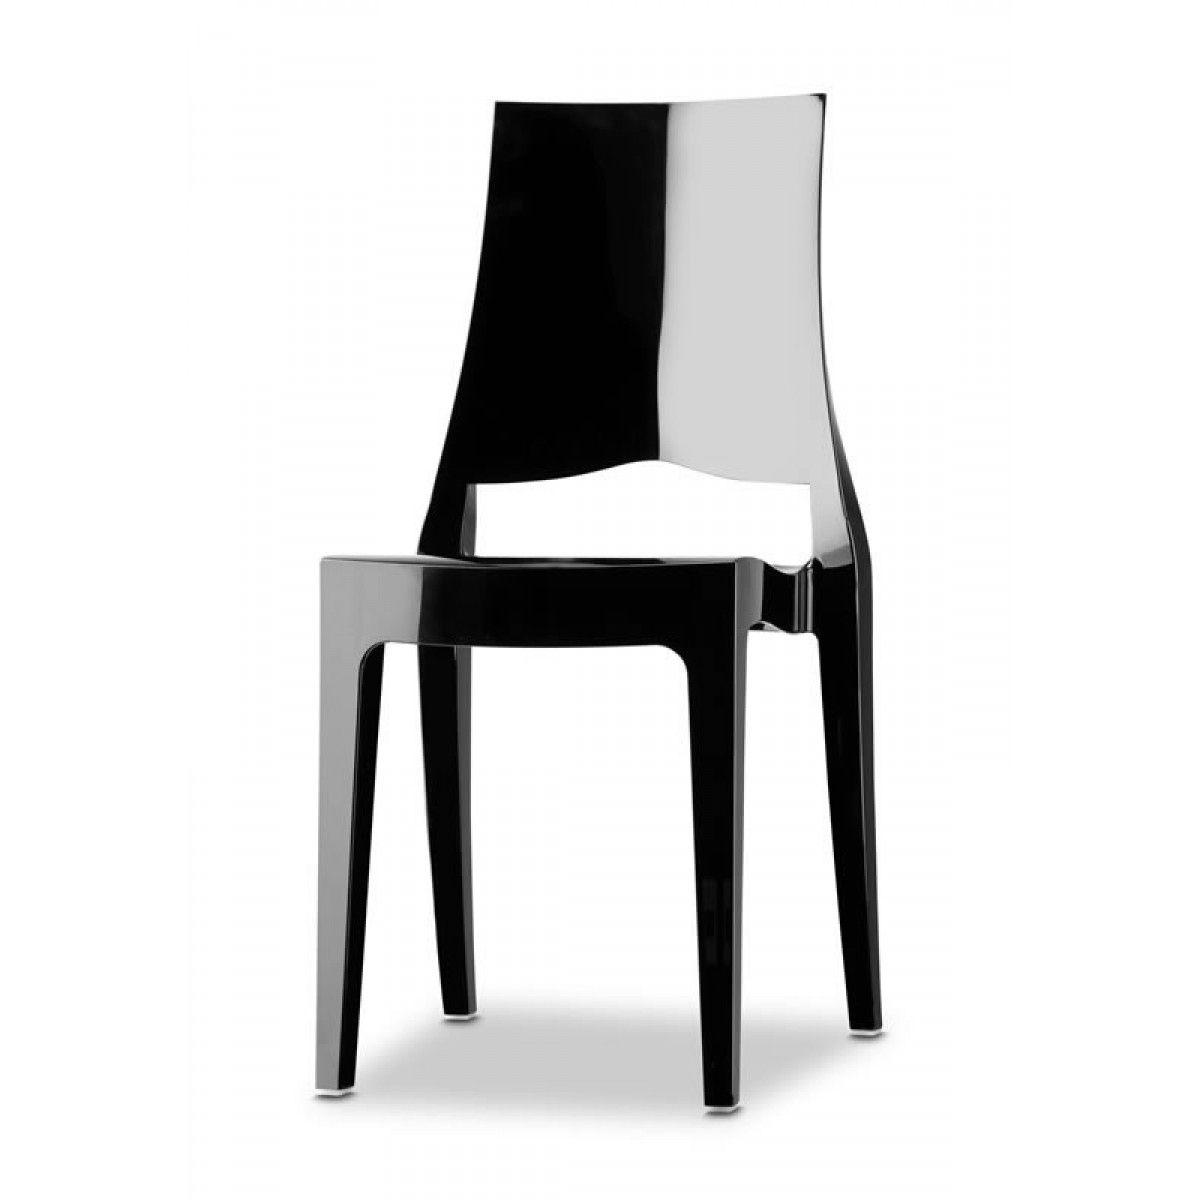 Pin Di Infinity Furniture Su Polycarbonate Chairs Sedie In Policarbonato Sedia Policarbonato Sedie Accessori Da Bagno